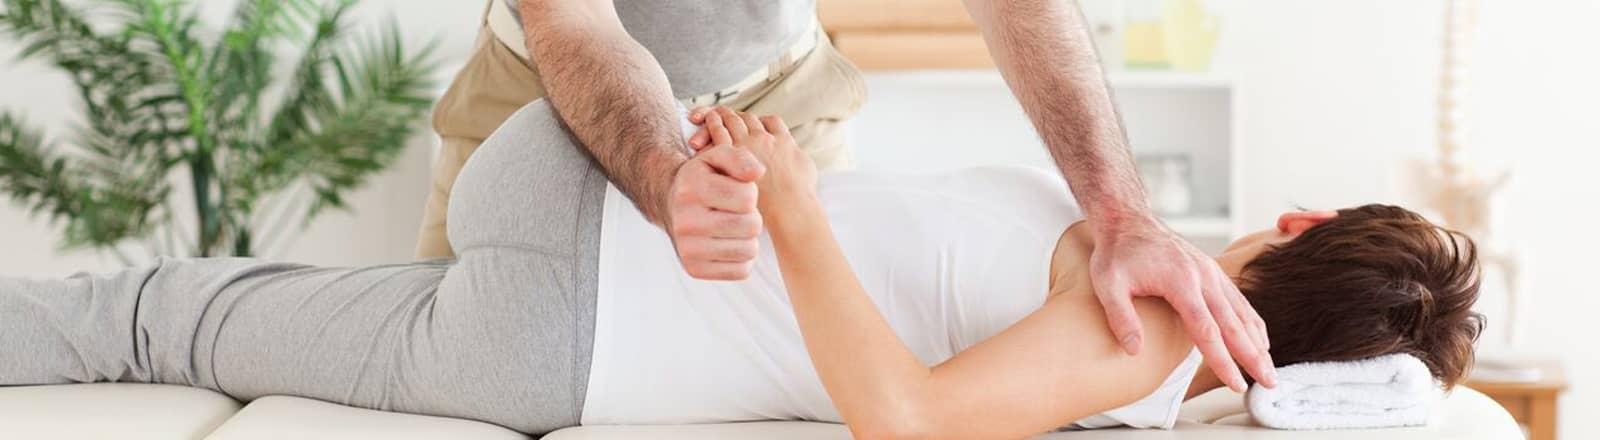 osteopatia atm Logroño